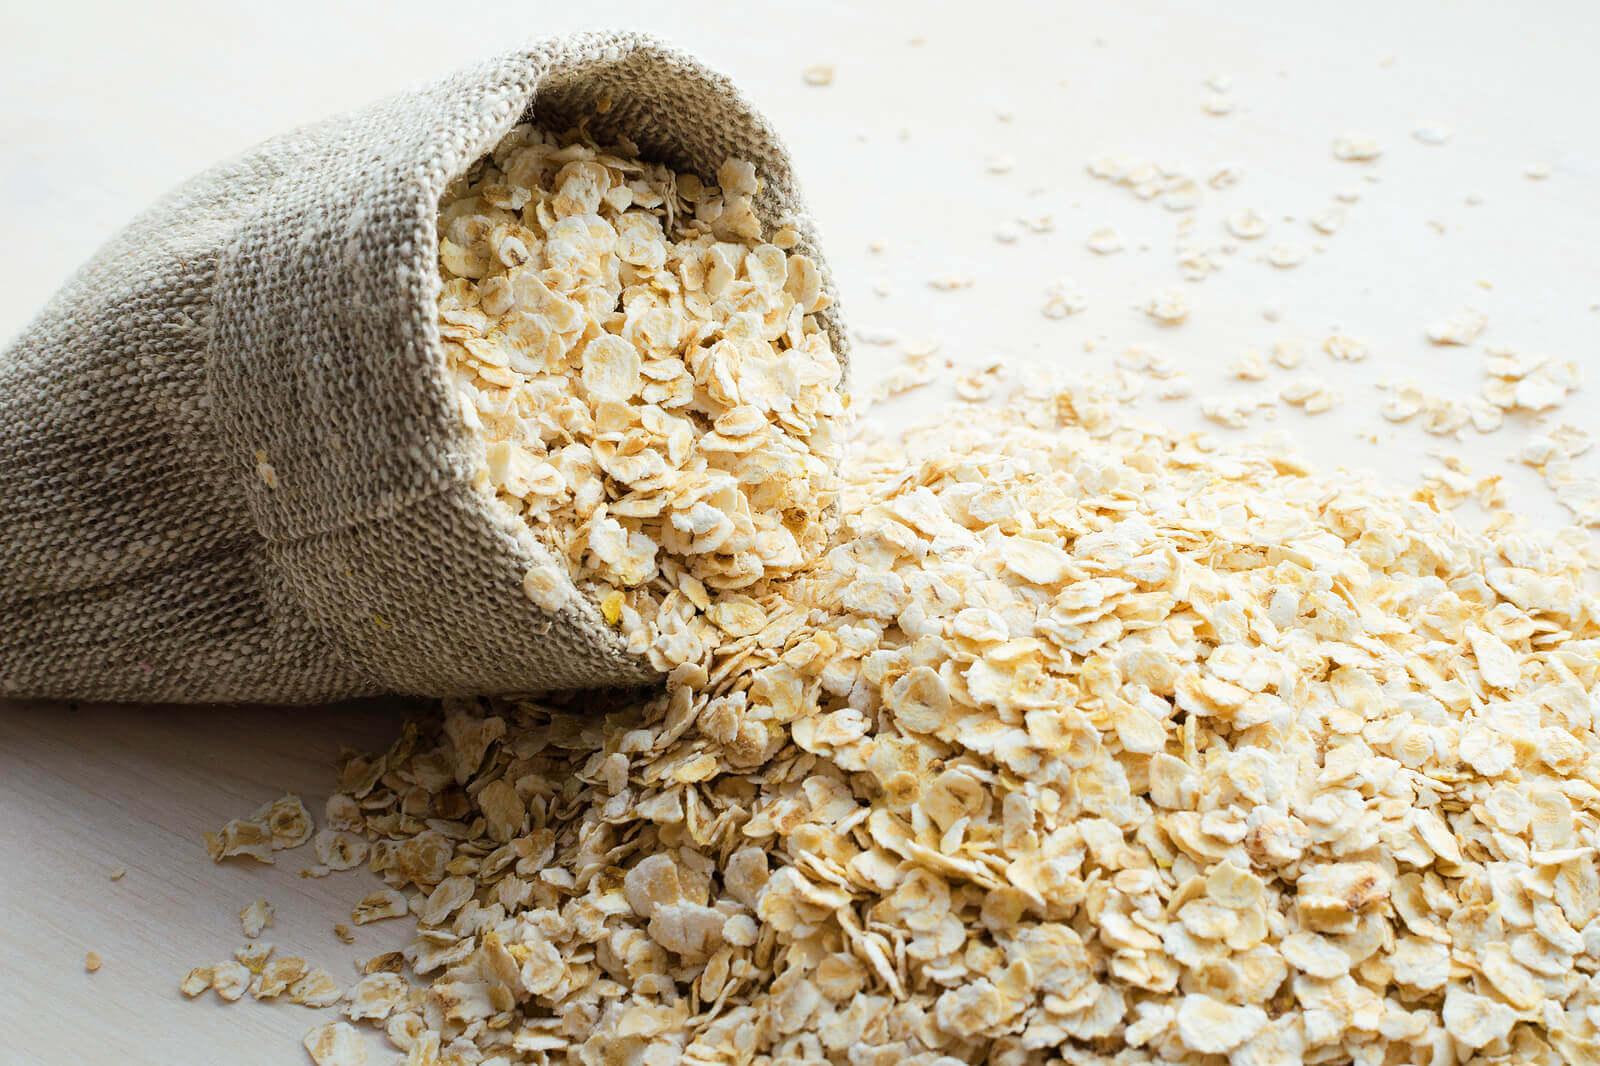 A sack of oats.